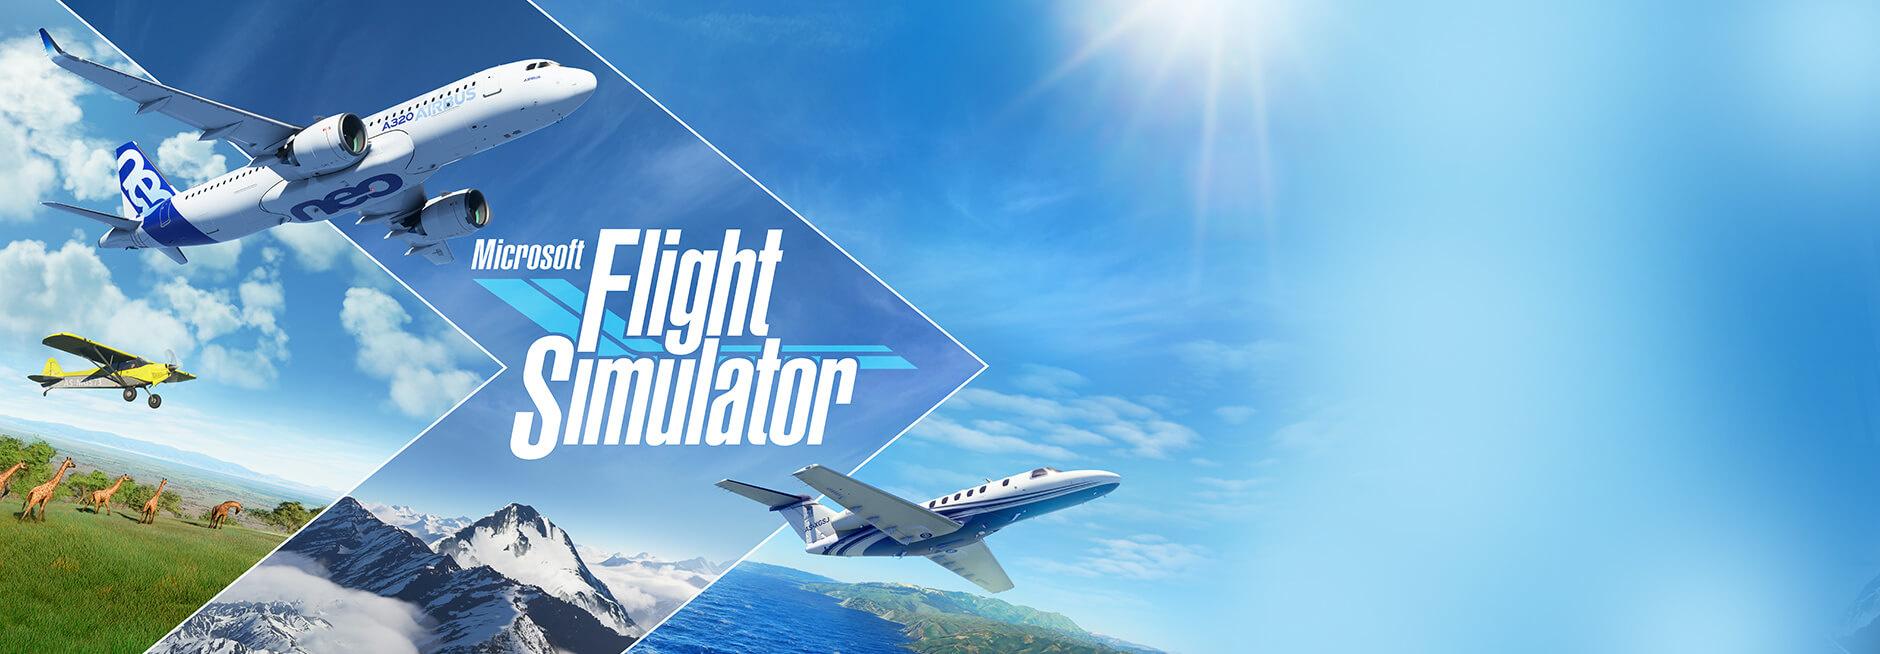 Flight Simulator Splash Screen